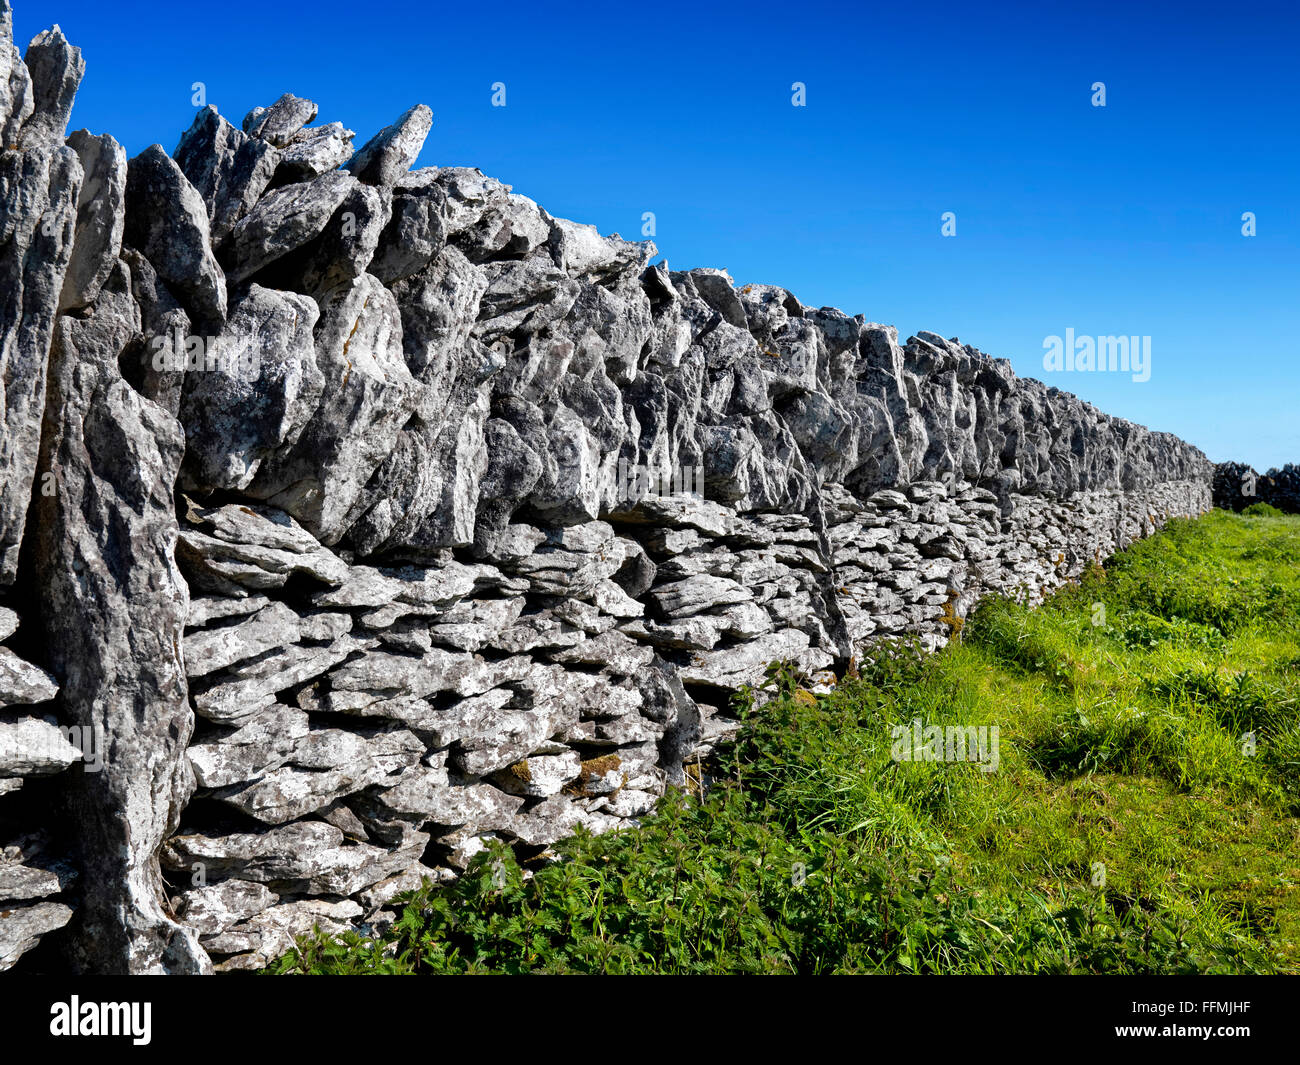 Dry stone wall, Burren , Clare, Ireland - Stock Image